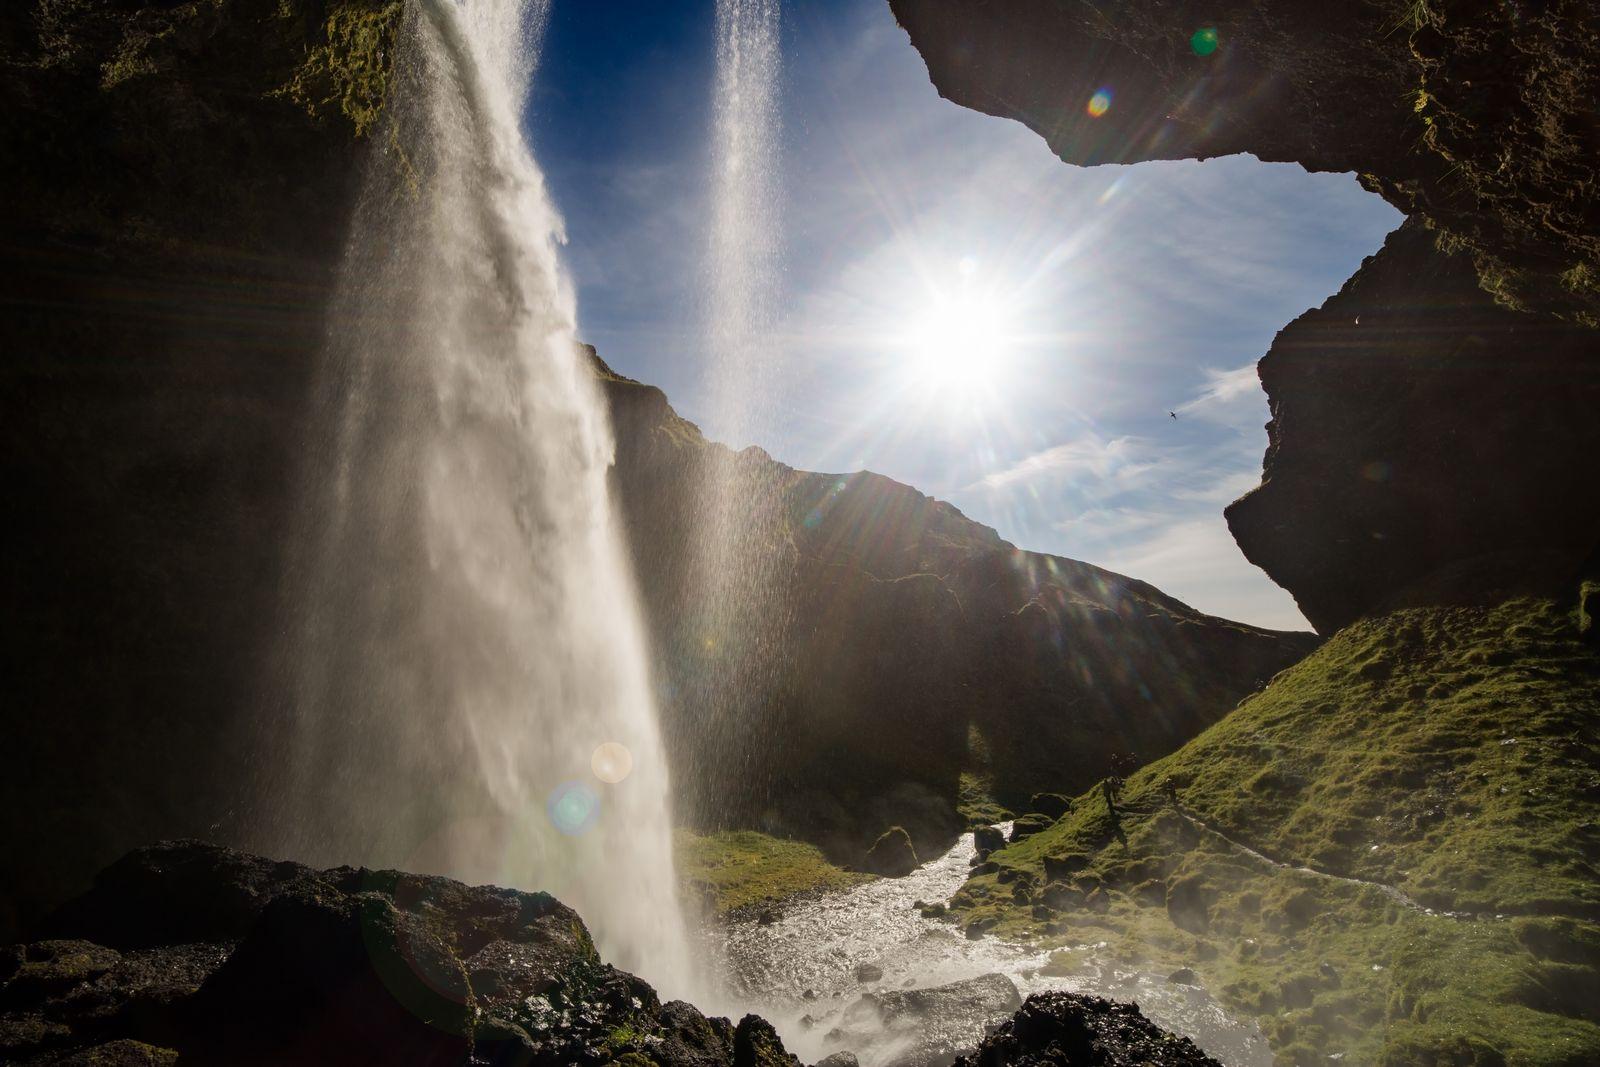 Nuestra 'cascada transitable' favorita